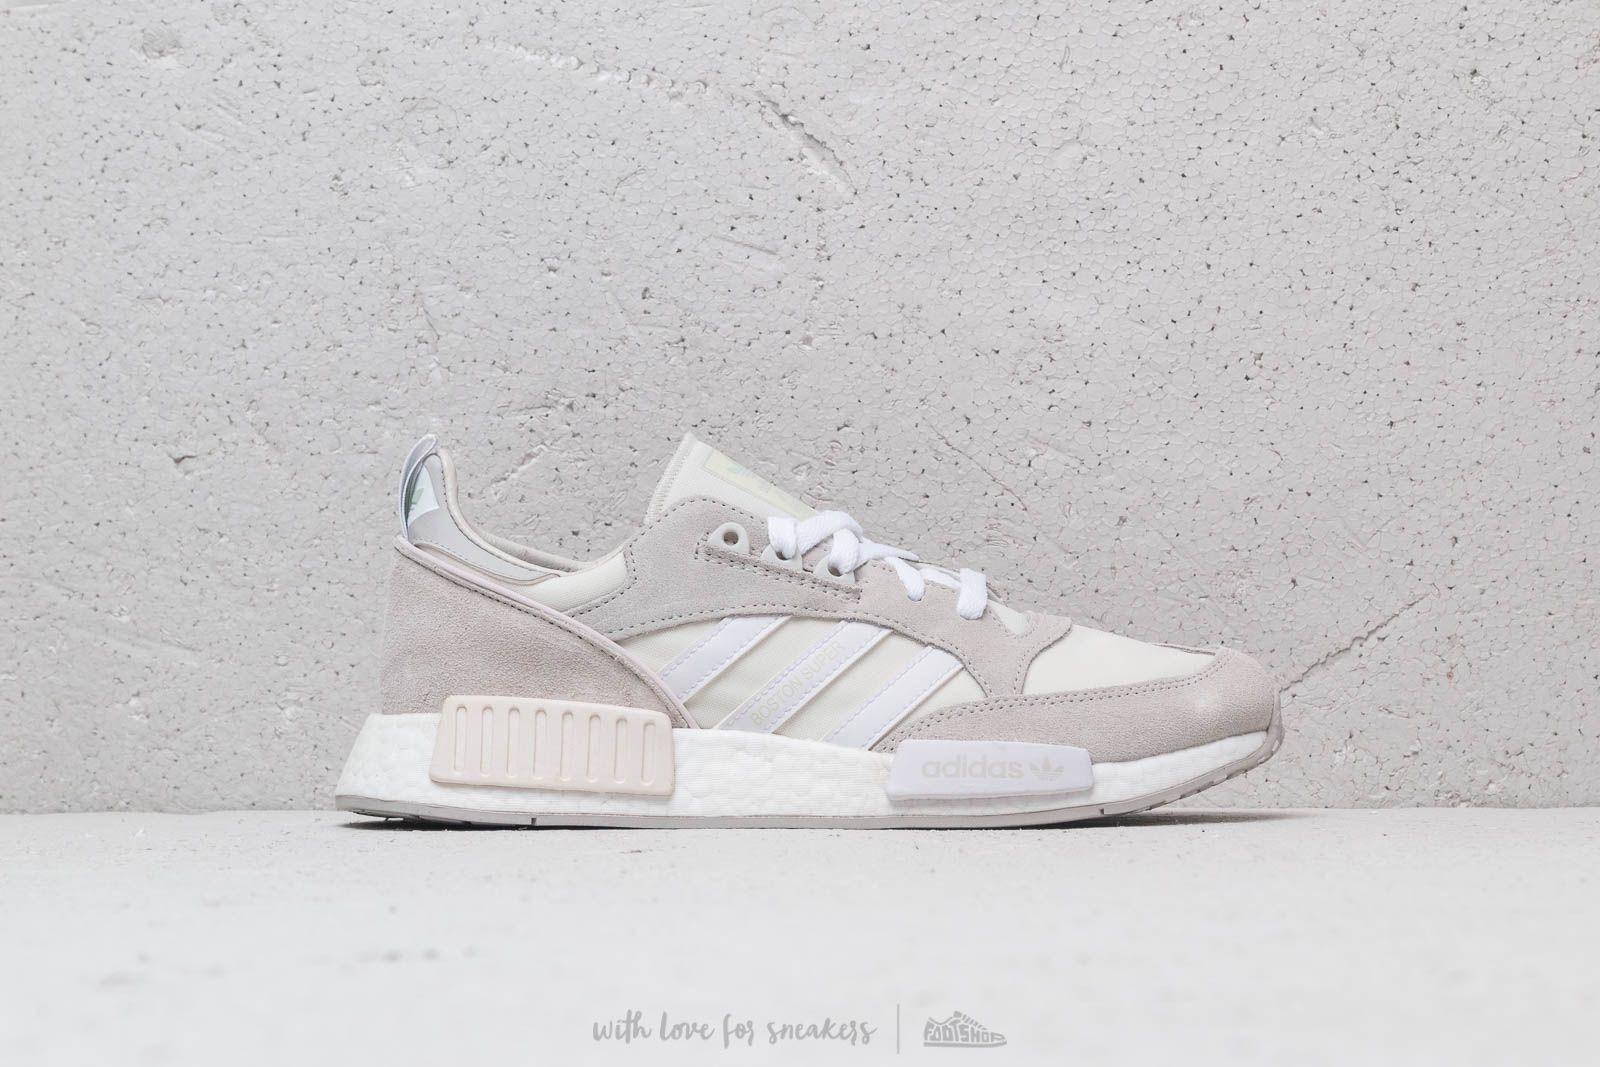 adidas Boston Super x R1 Cloud White Ftw White Grey One | Footshop